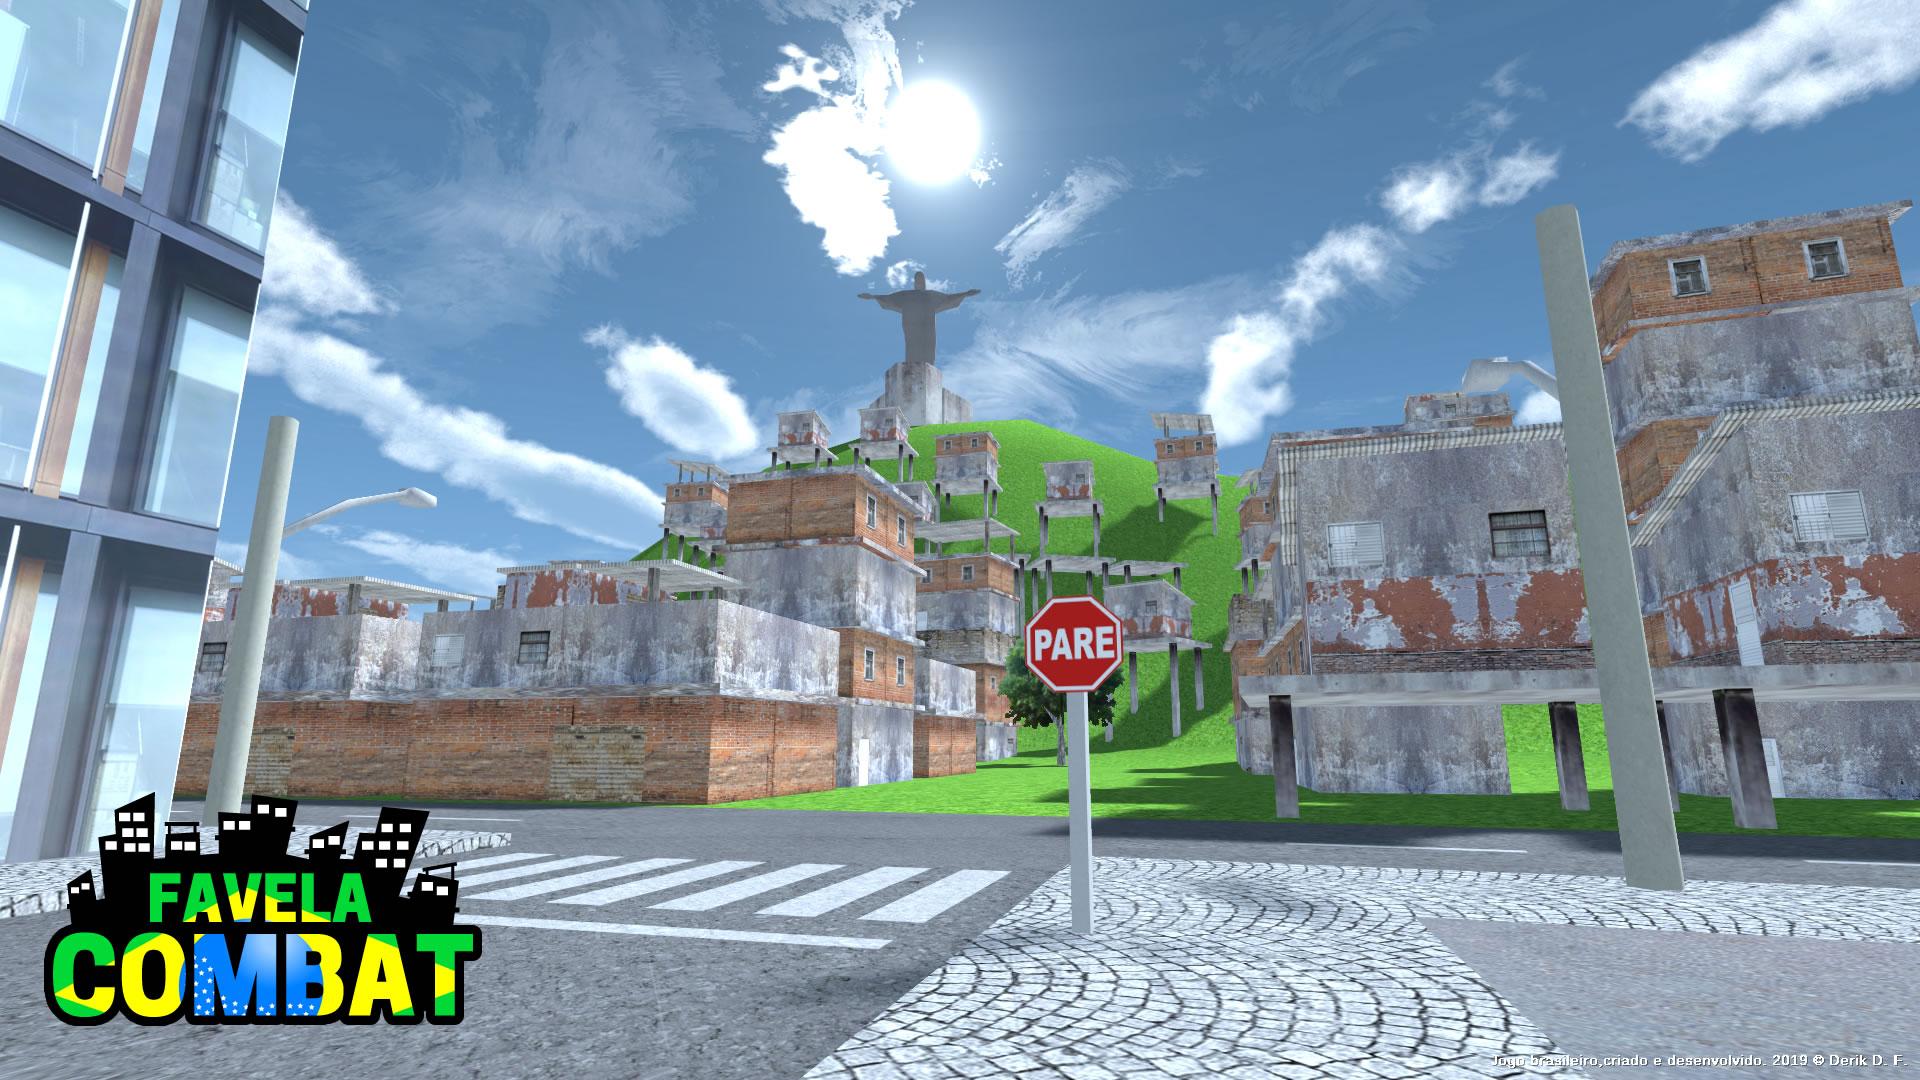 favela-combat-android-ios-01.jpg